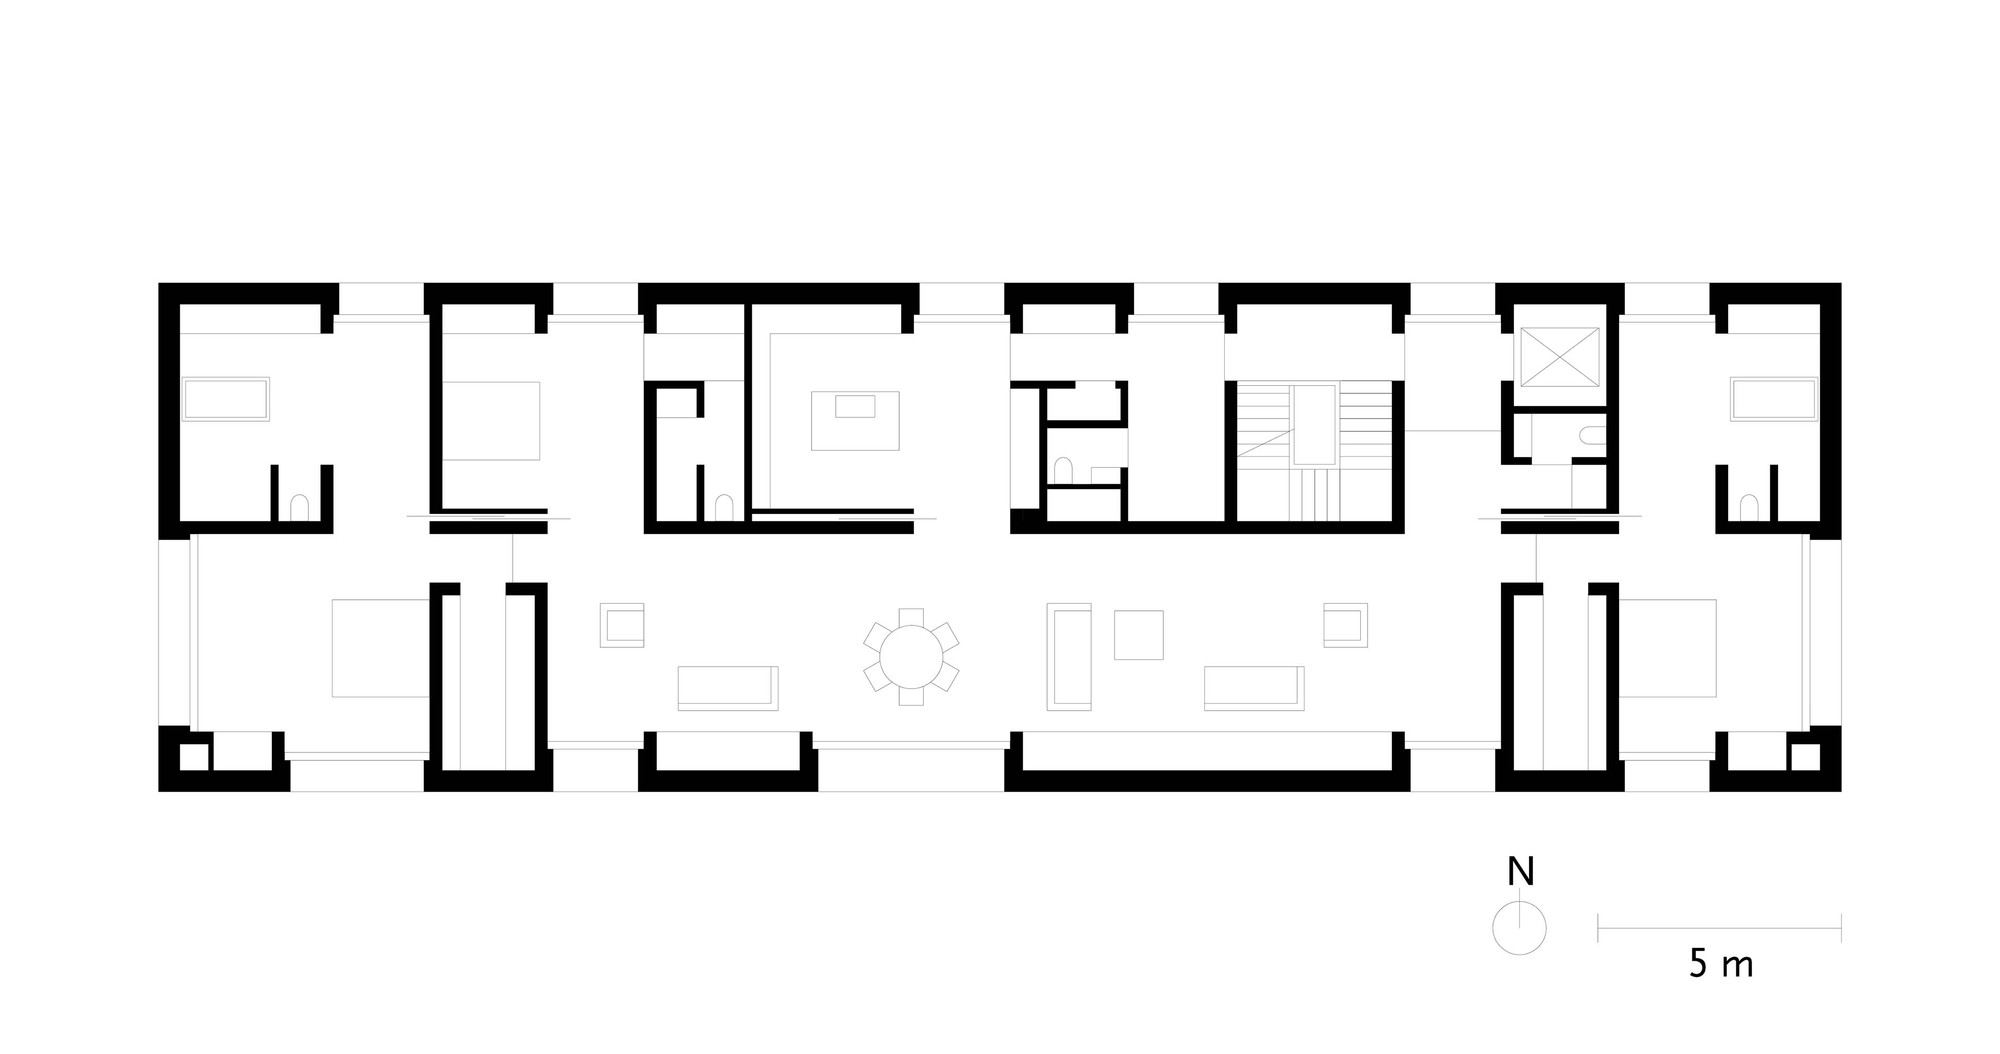 Glass Farmhouse West 37th Street Studio Condo Manhattan likewise Apartment Floor Plans 20x40 2 Floor further 900 Square Feet 2 Bedrooms 1 Bathroom Country House Plans 0 Garage 23942 additionally 127719339405678039 likewise 5649371de58ecee8fb000426 Xixi Wetland Estate David Chipperfield Architects Plus Floor Plan. on 1 br apt floor plan